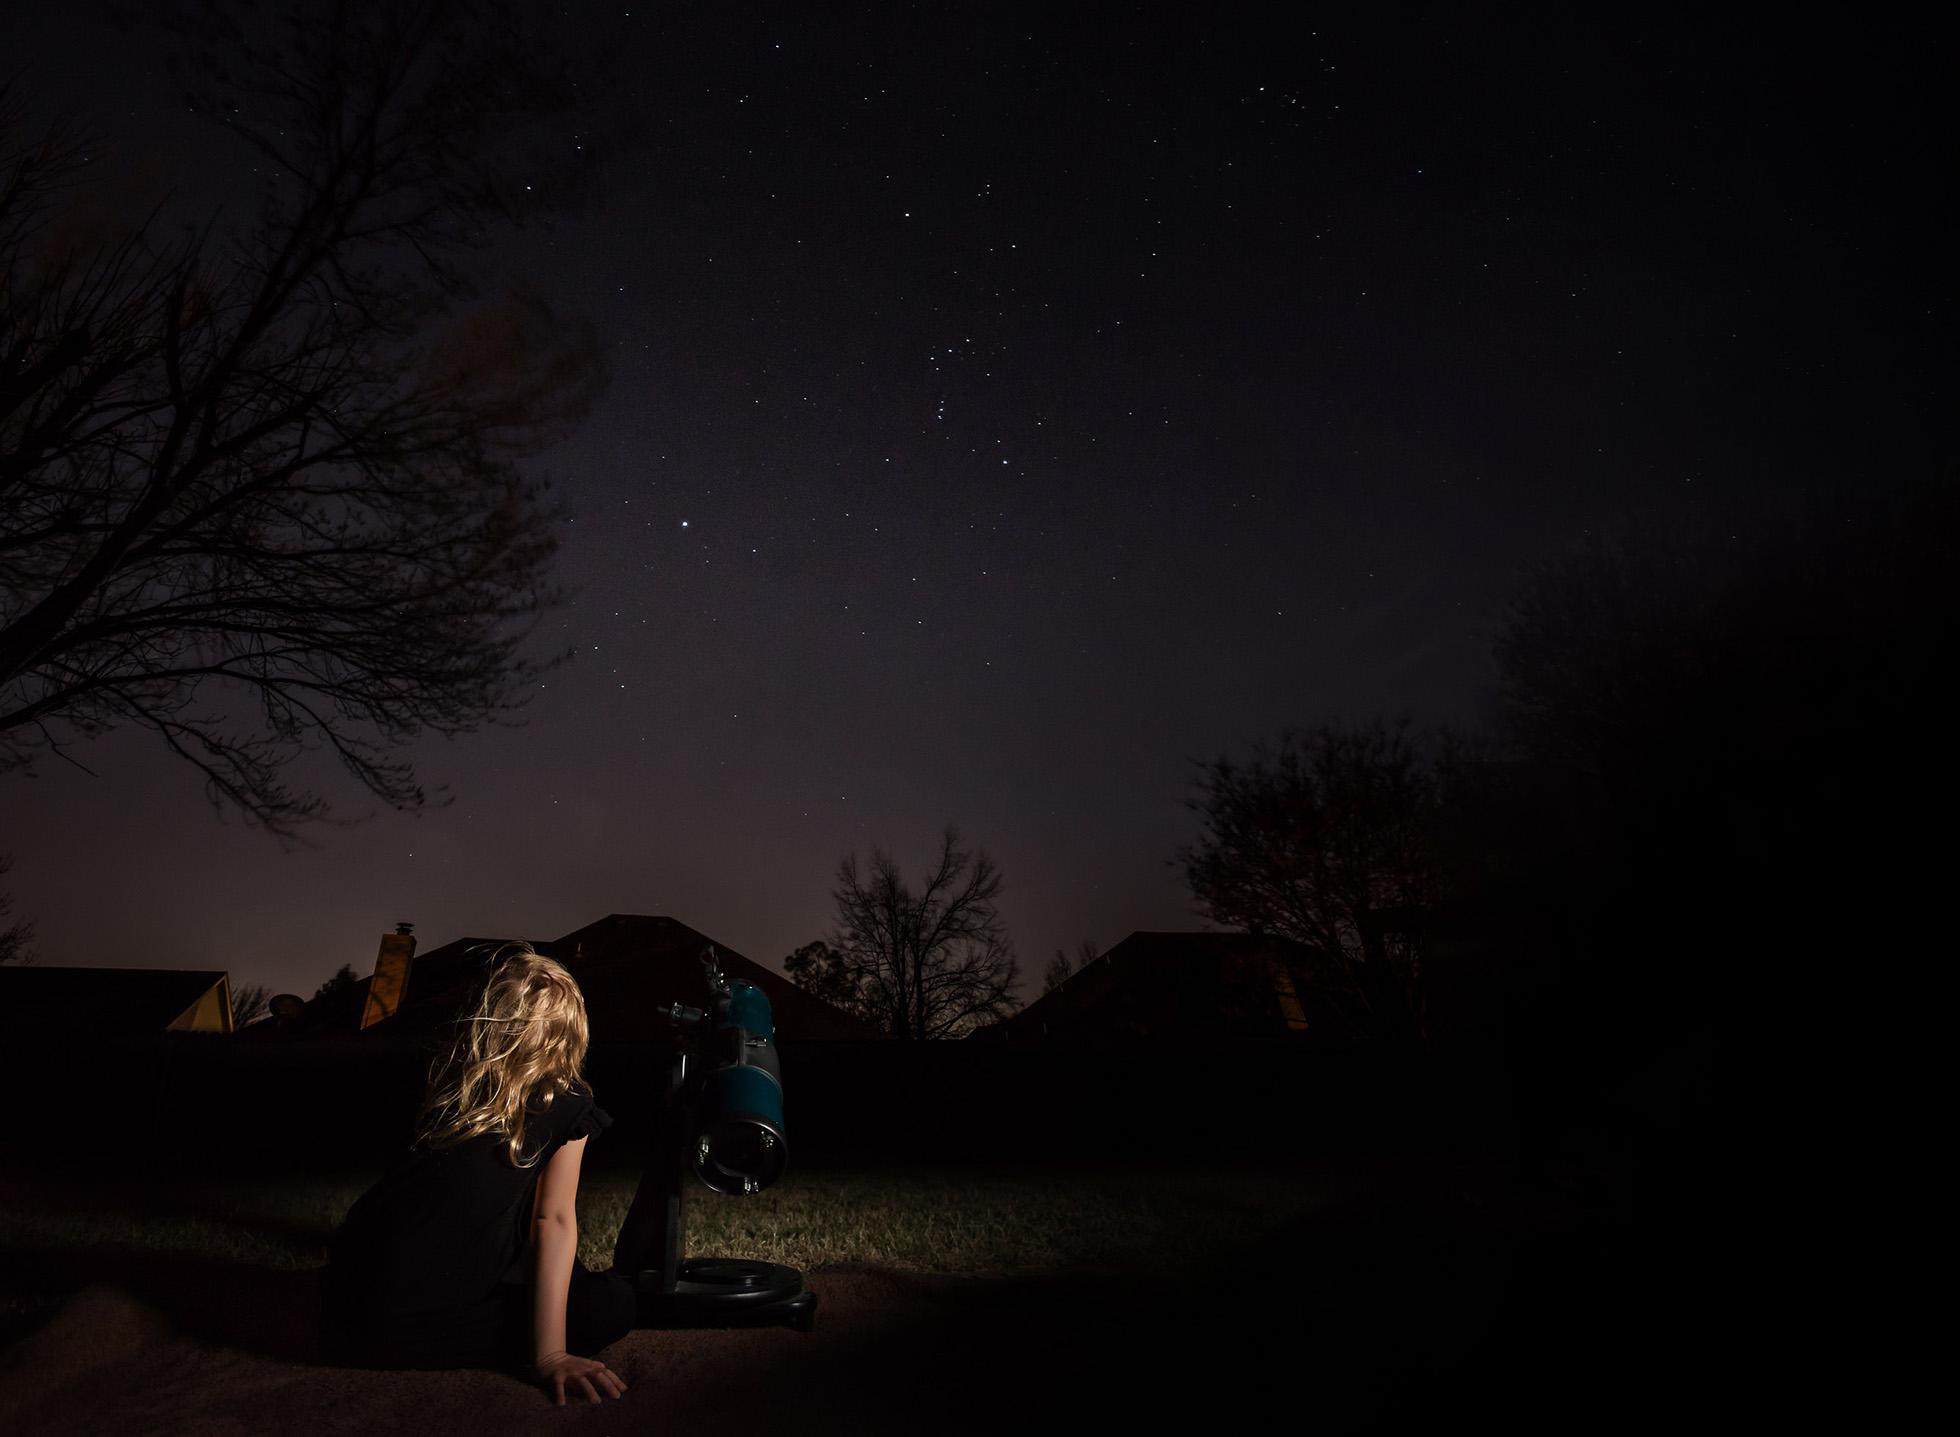 stargazer girl child telescope night photography low light photography lifestyle westcott ice light astronomy kate luber & Stargazer by Kate Luber